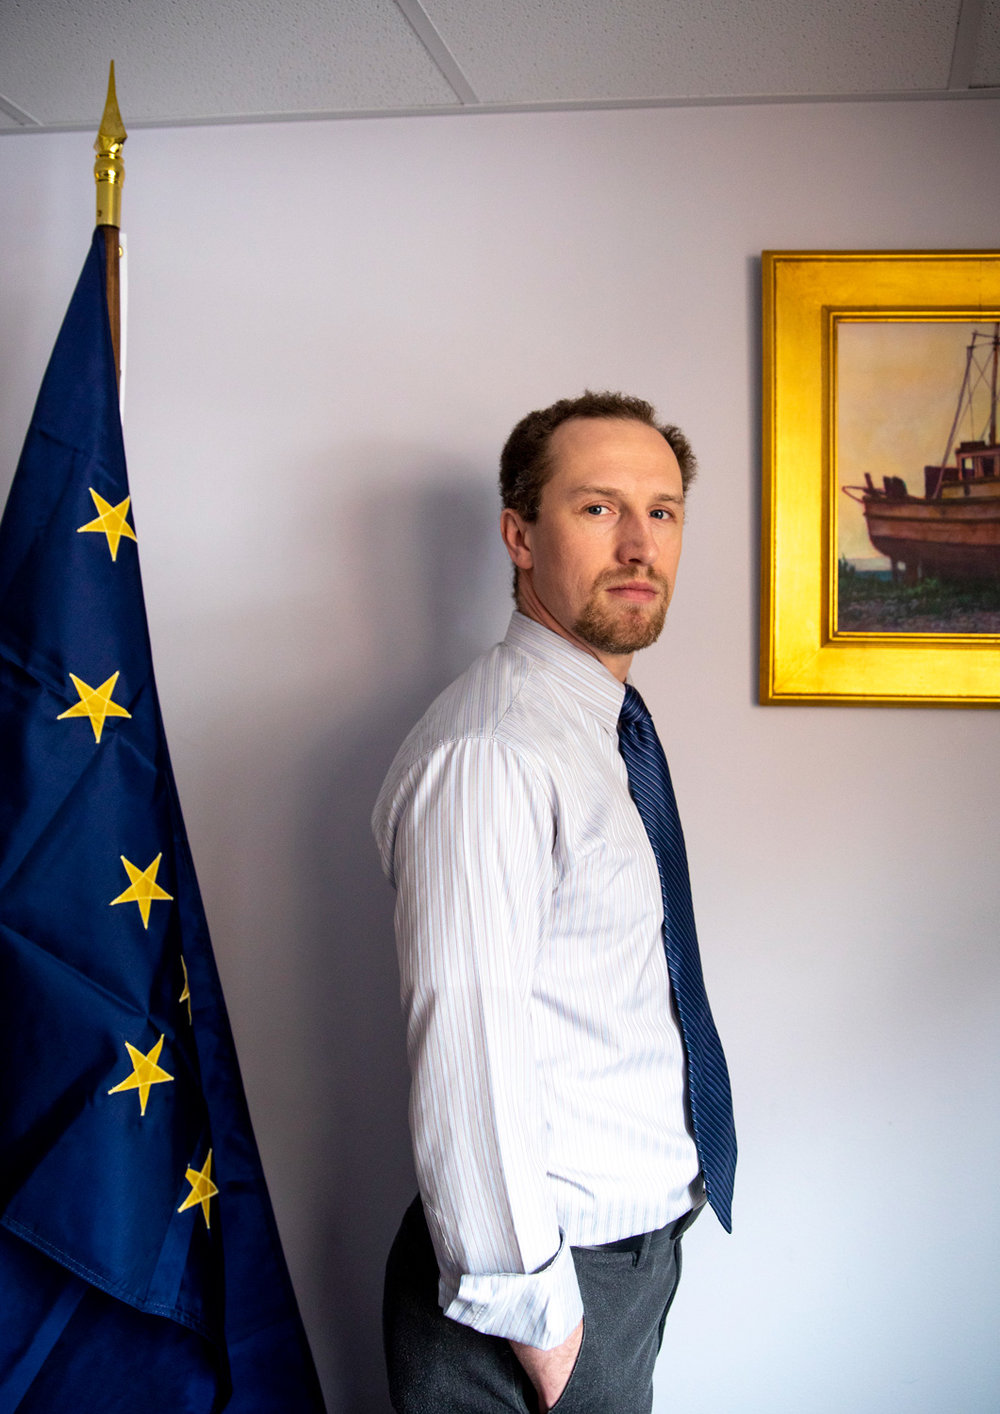 Nathaniel Grabman, Legislative Aide